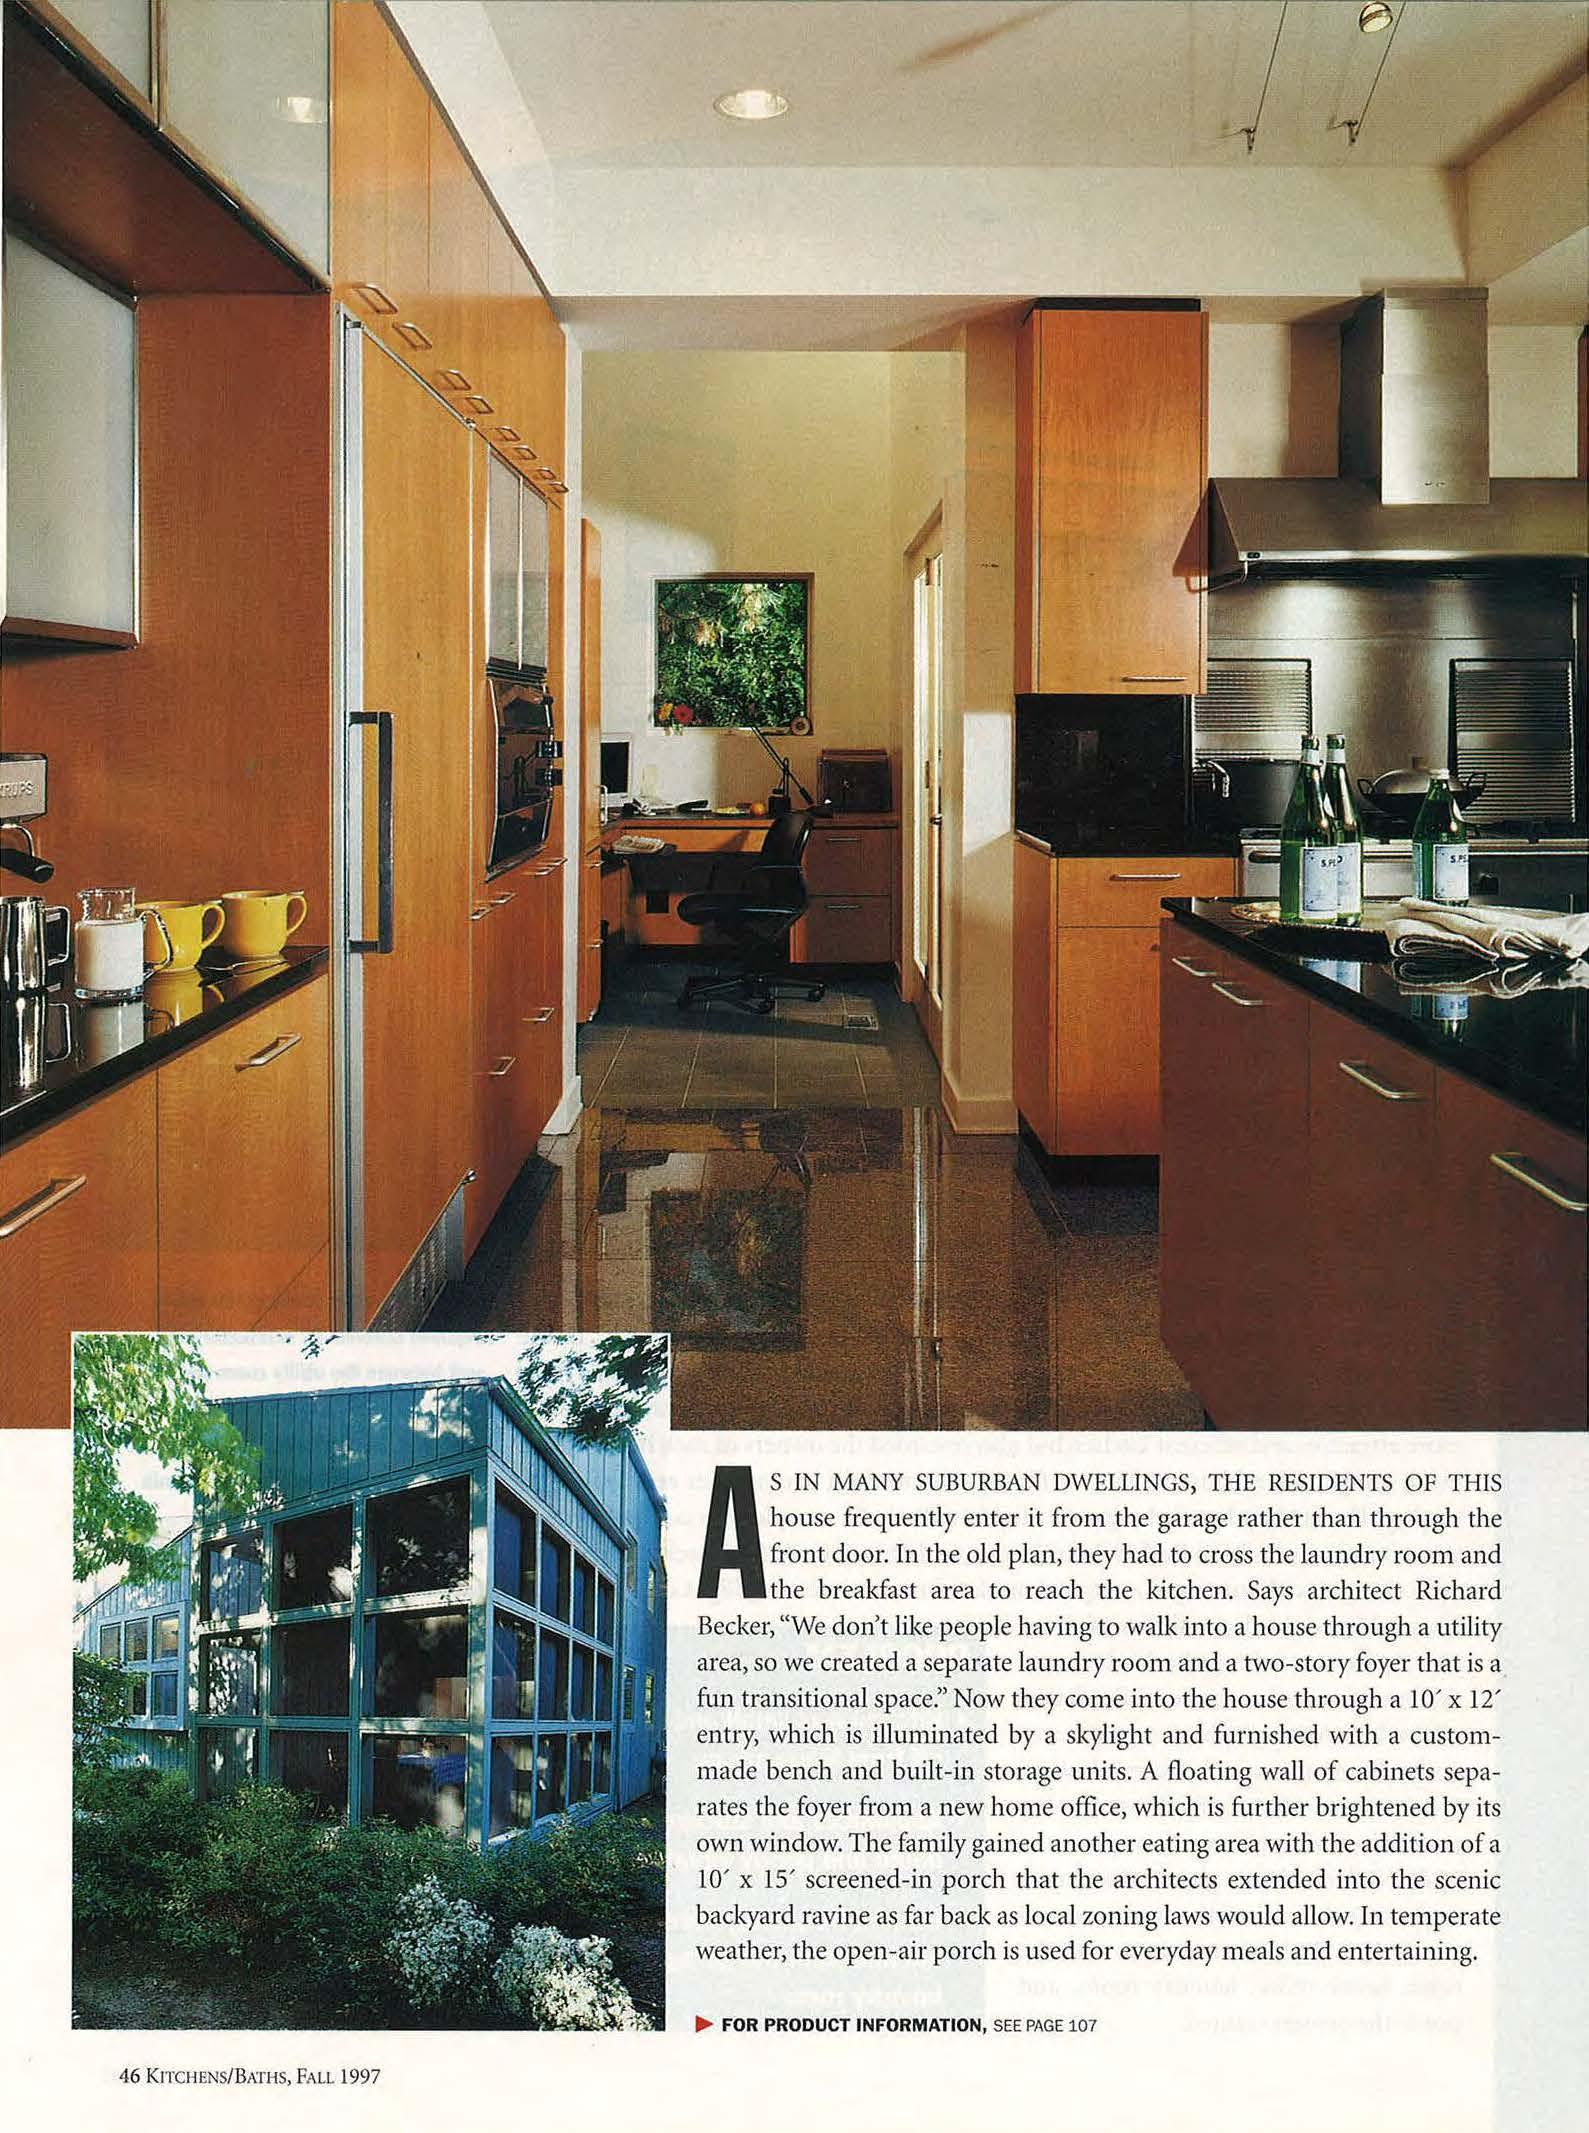 1997 House Beautiful Kitchens & Baths _Page_6.jpg